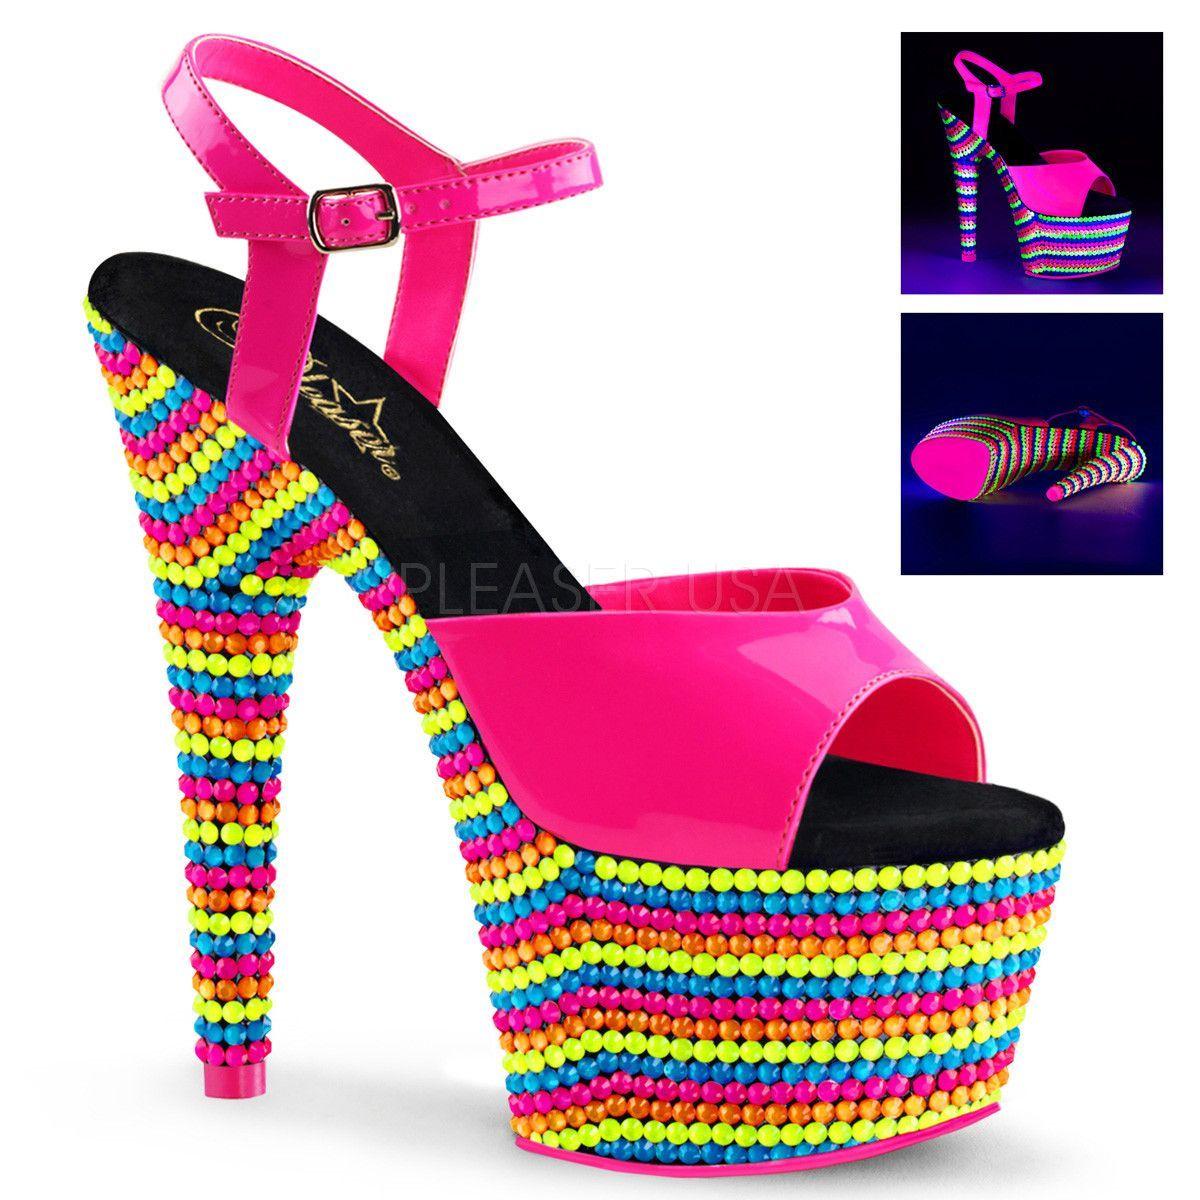 Pleaser Adore 709RBS Ankle Strap Sandal (Women's) 9qhpeDx